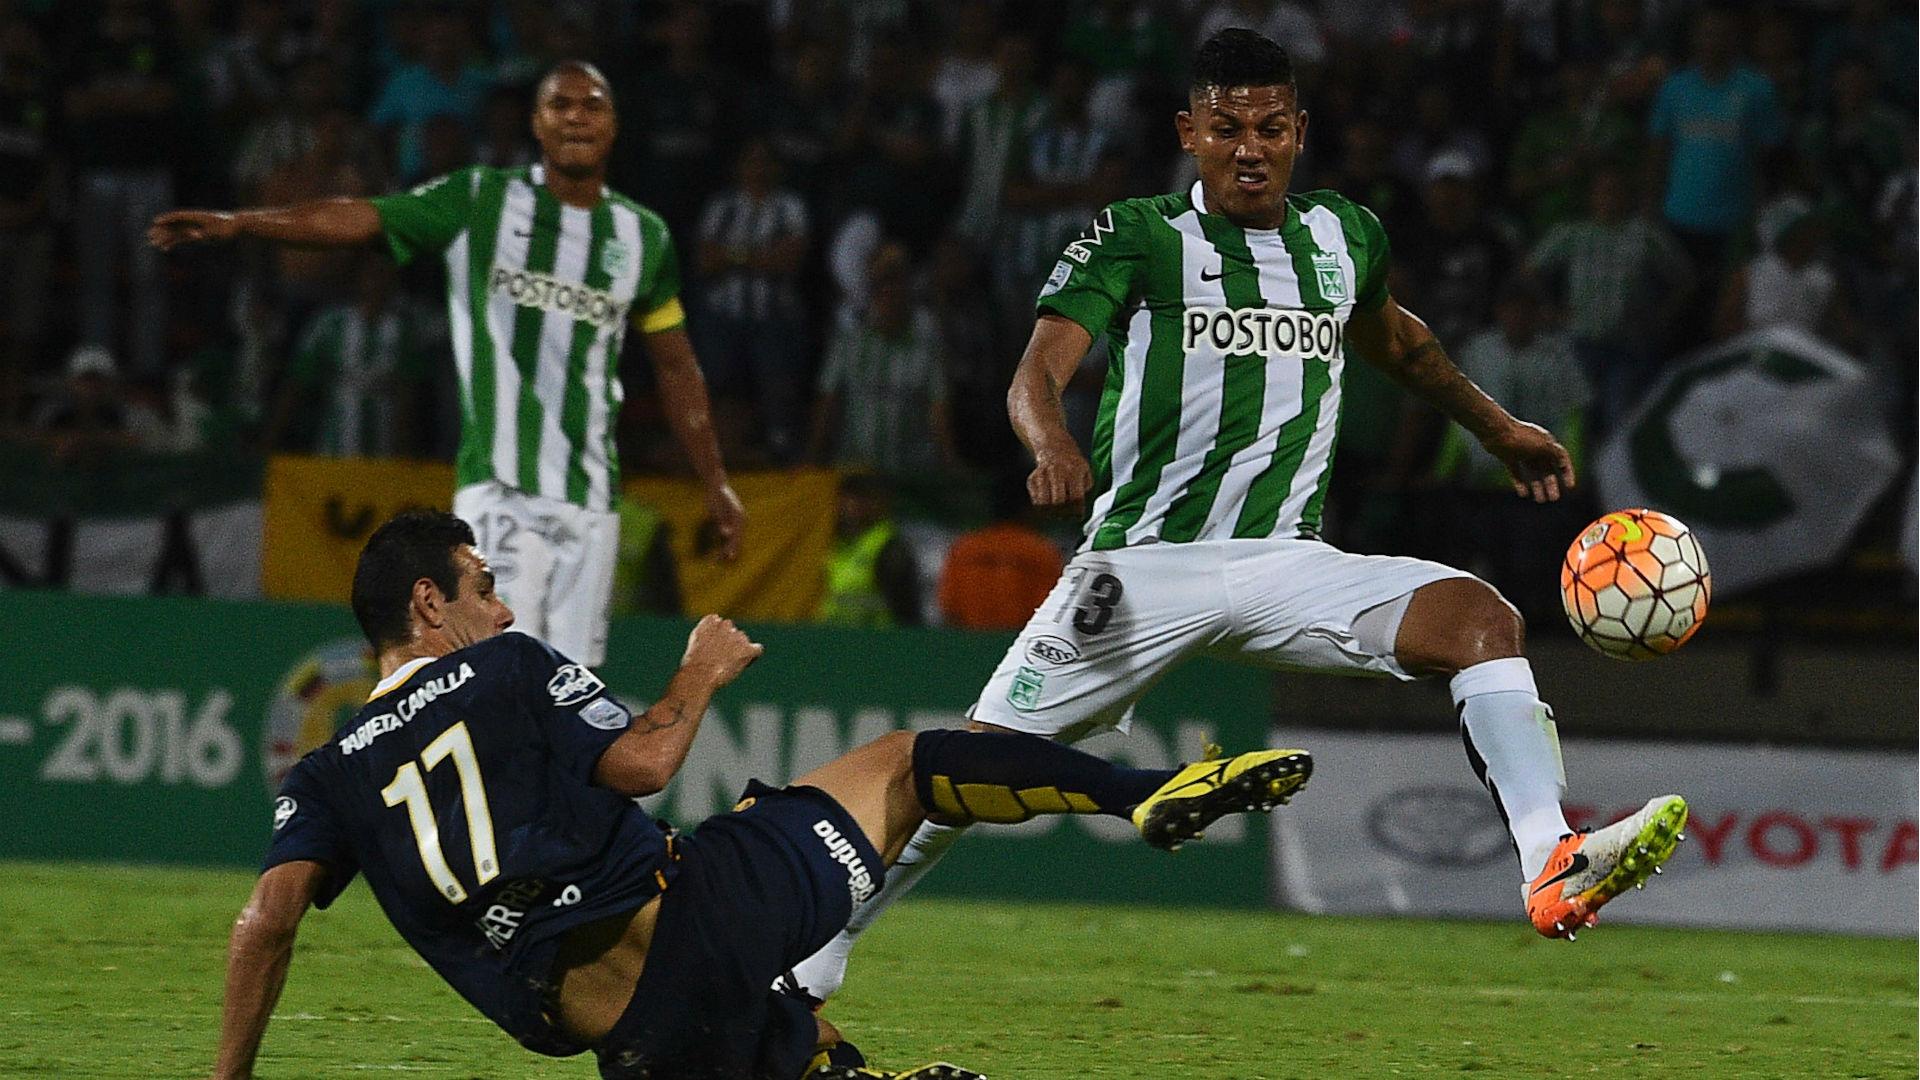 Atlético Nacional vs Rosario Central Copa Libertadores